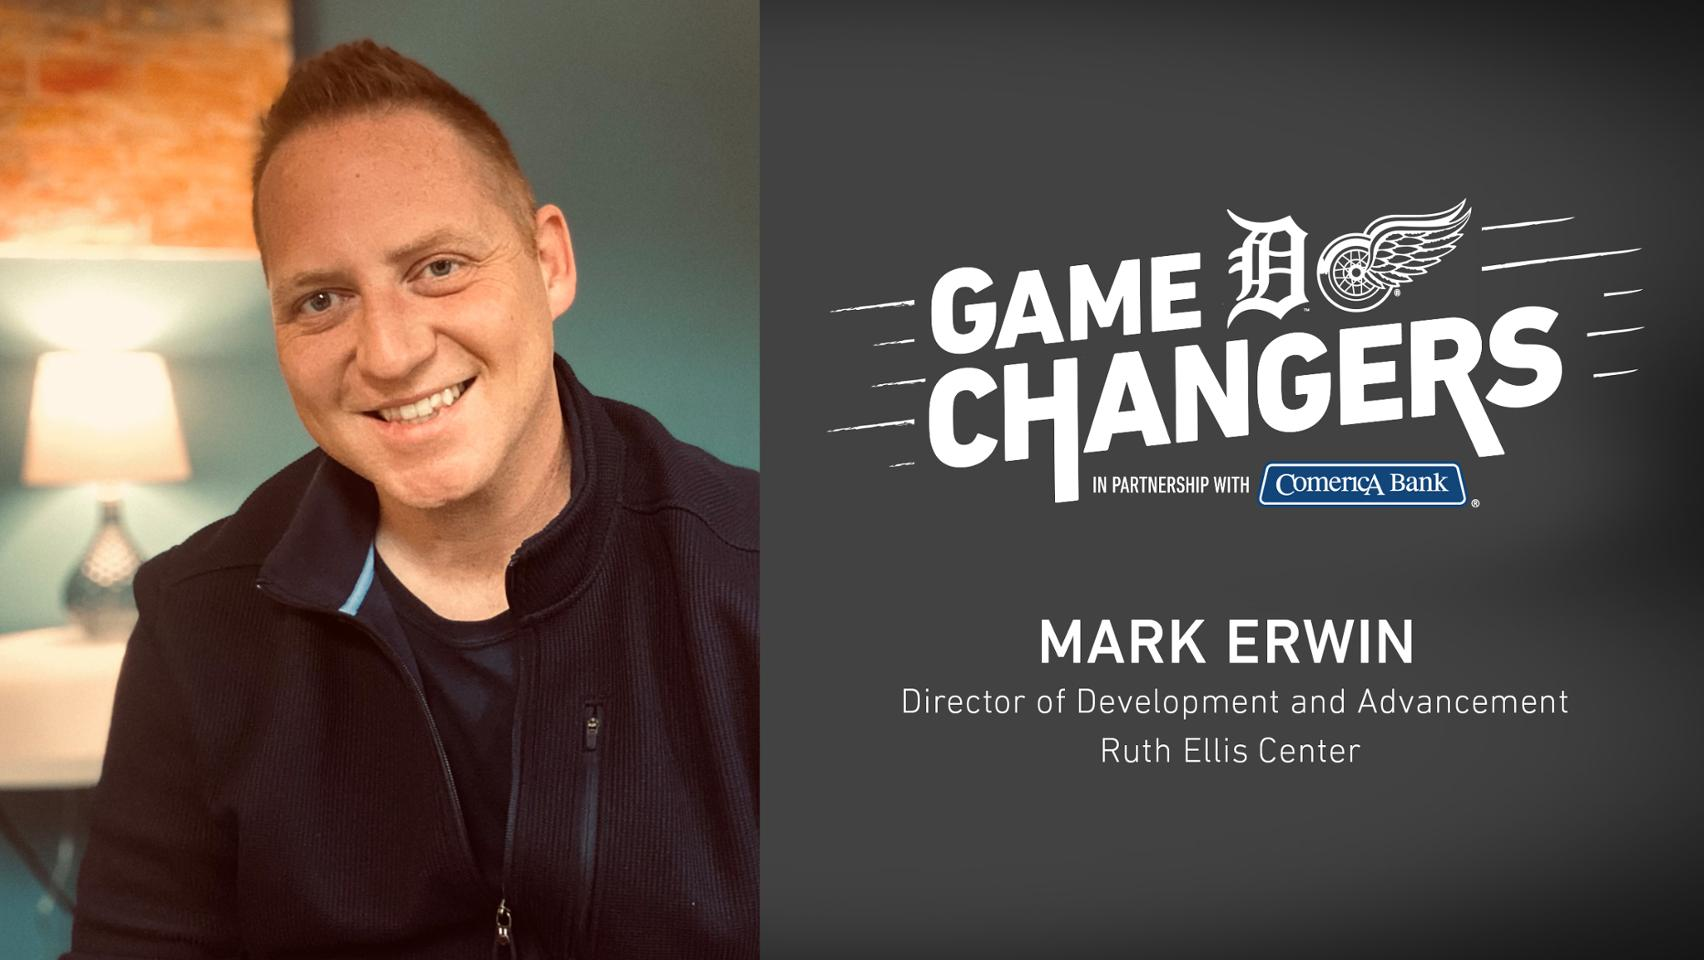 Mark Erwin